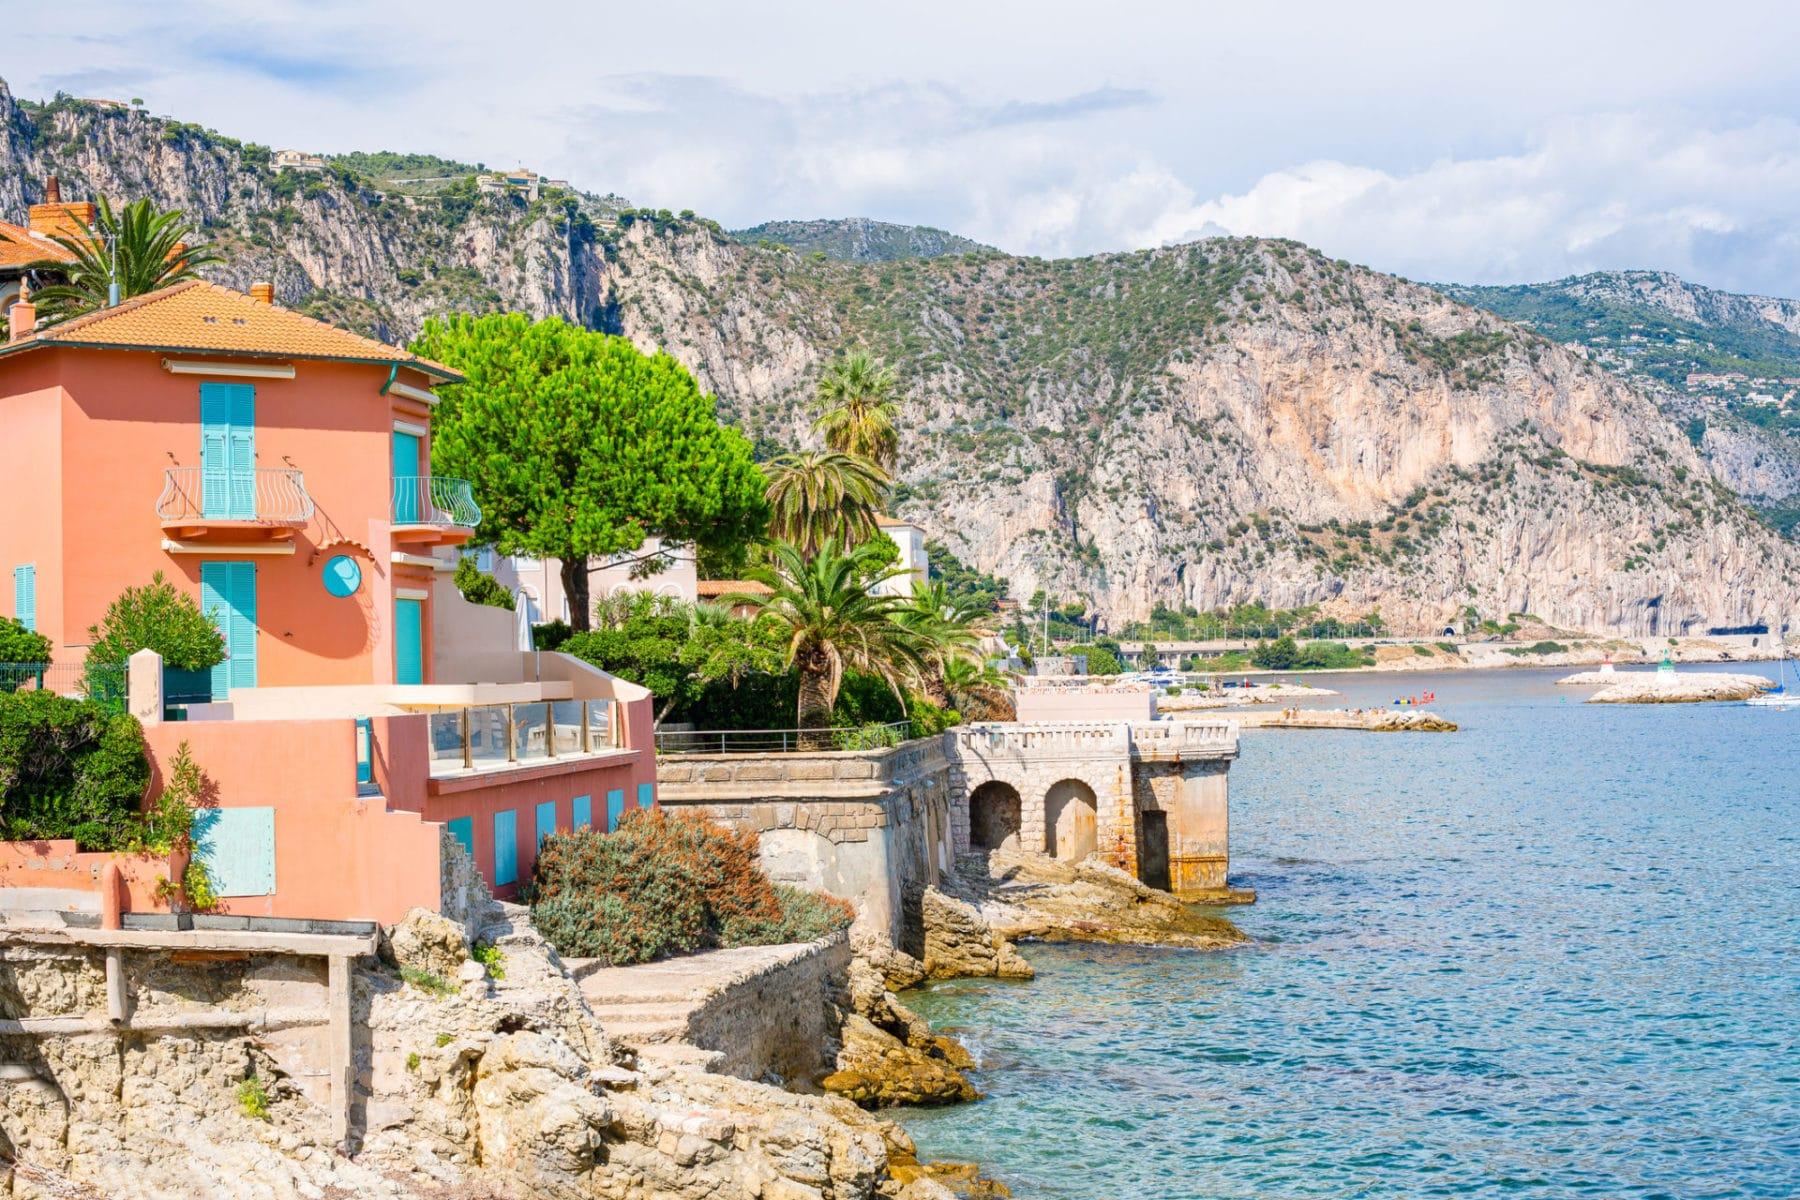 iStock - Coastline of Beaulieu-Sur-Mer, Cote d'Azur, France